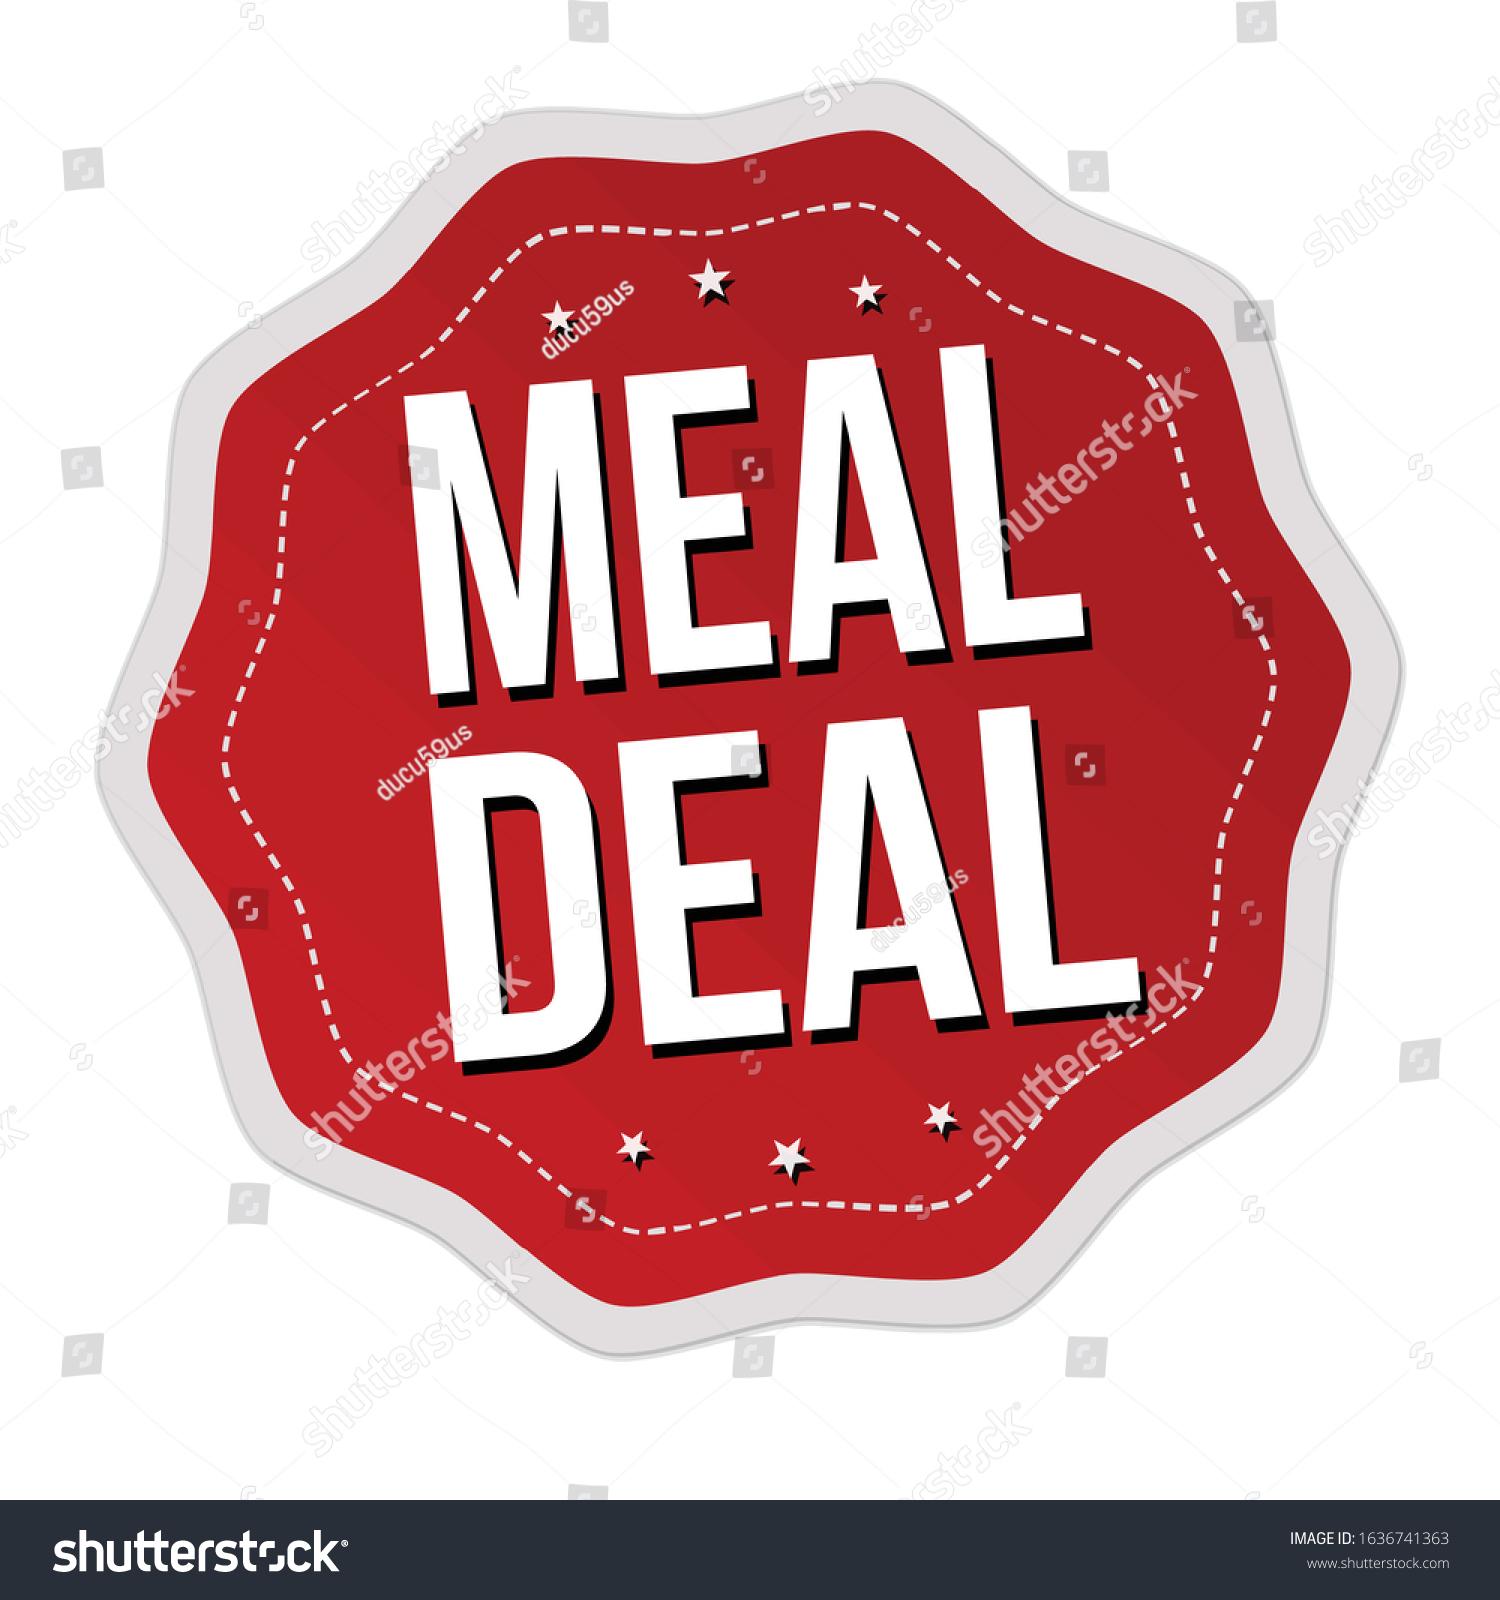 Meal Deal 8 Jan